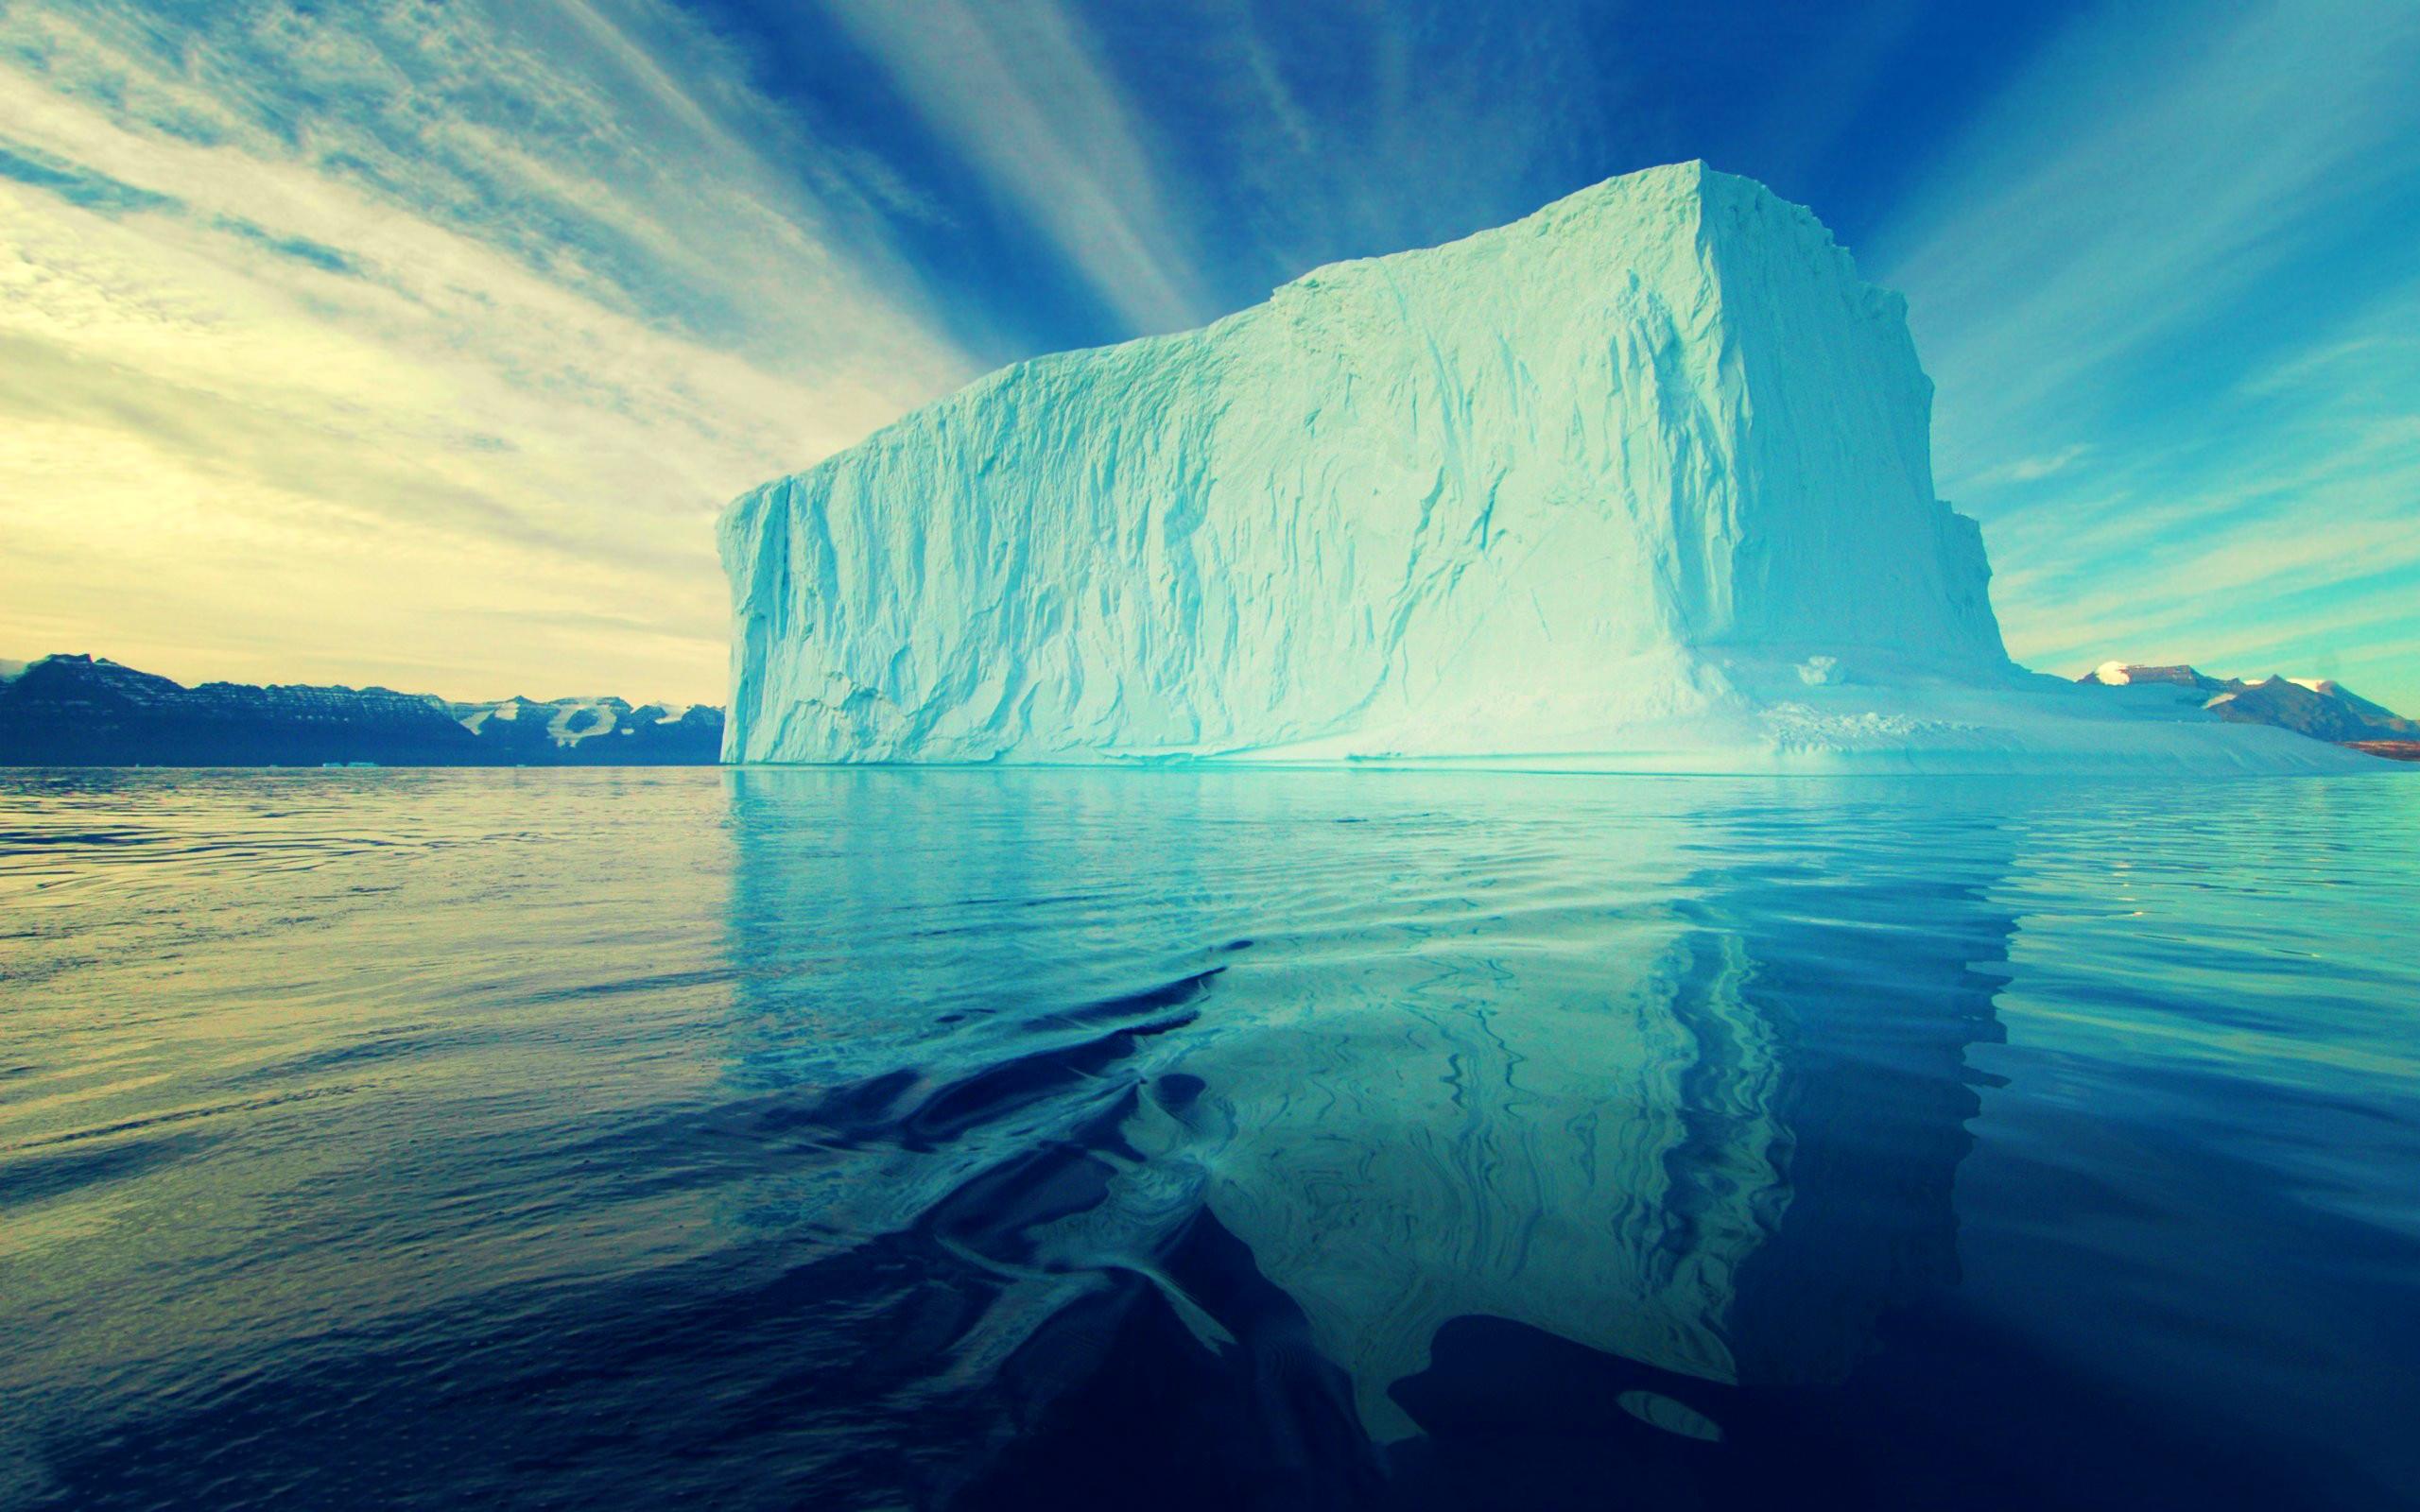 iceberg wallpaper 1080p hd